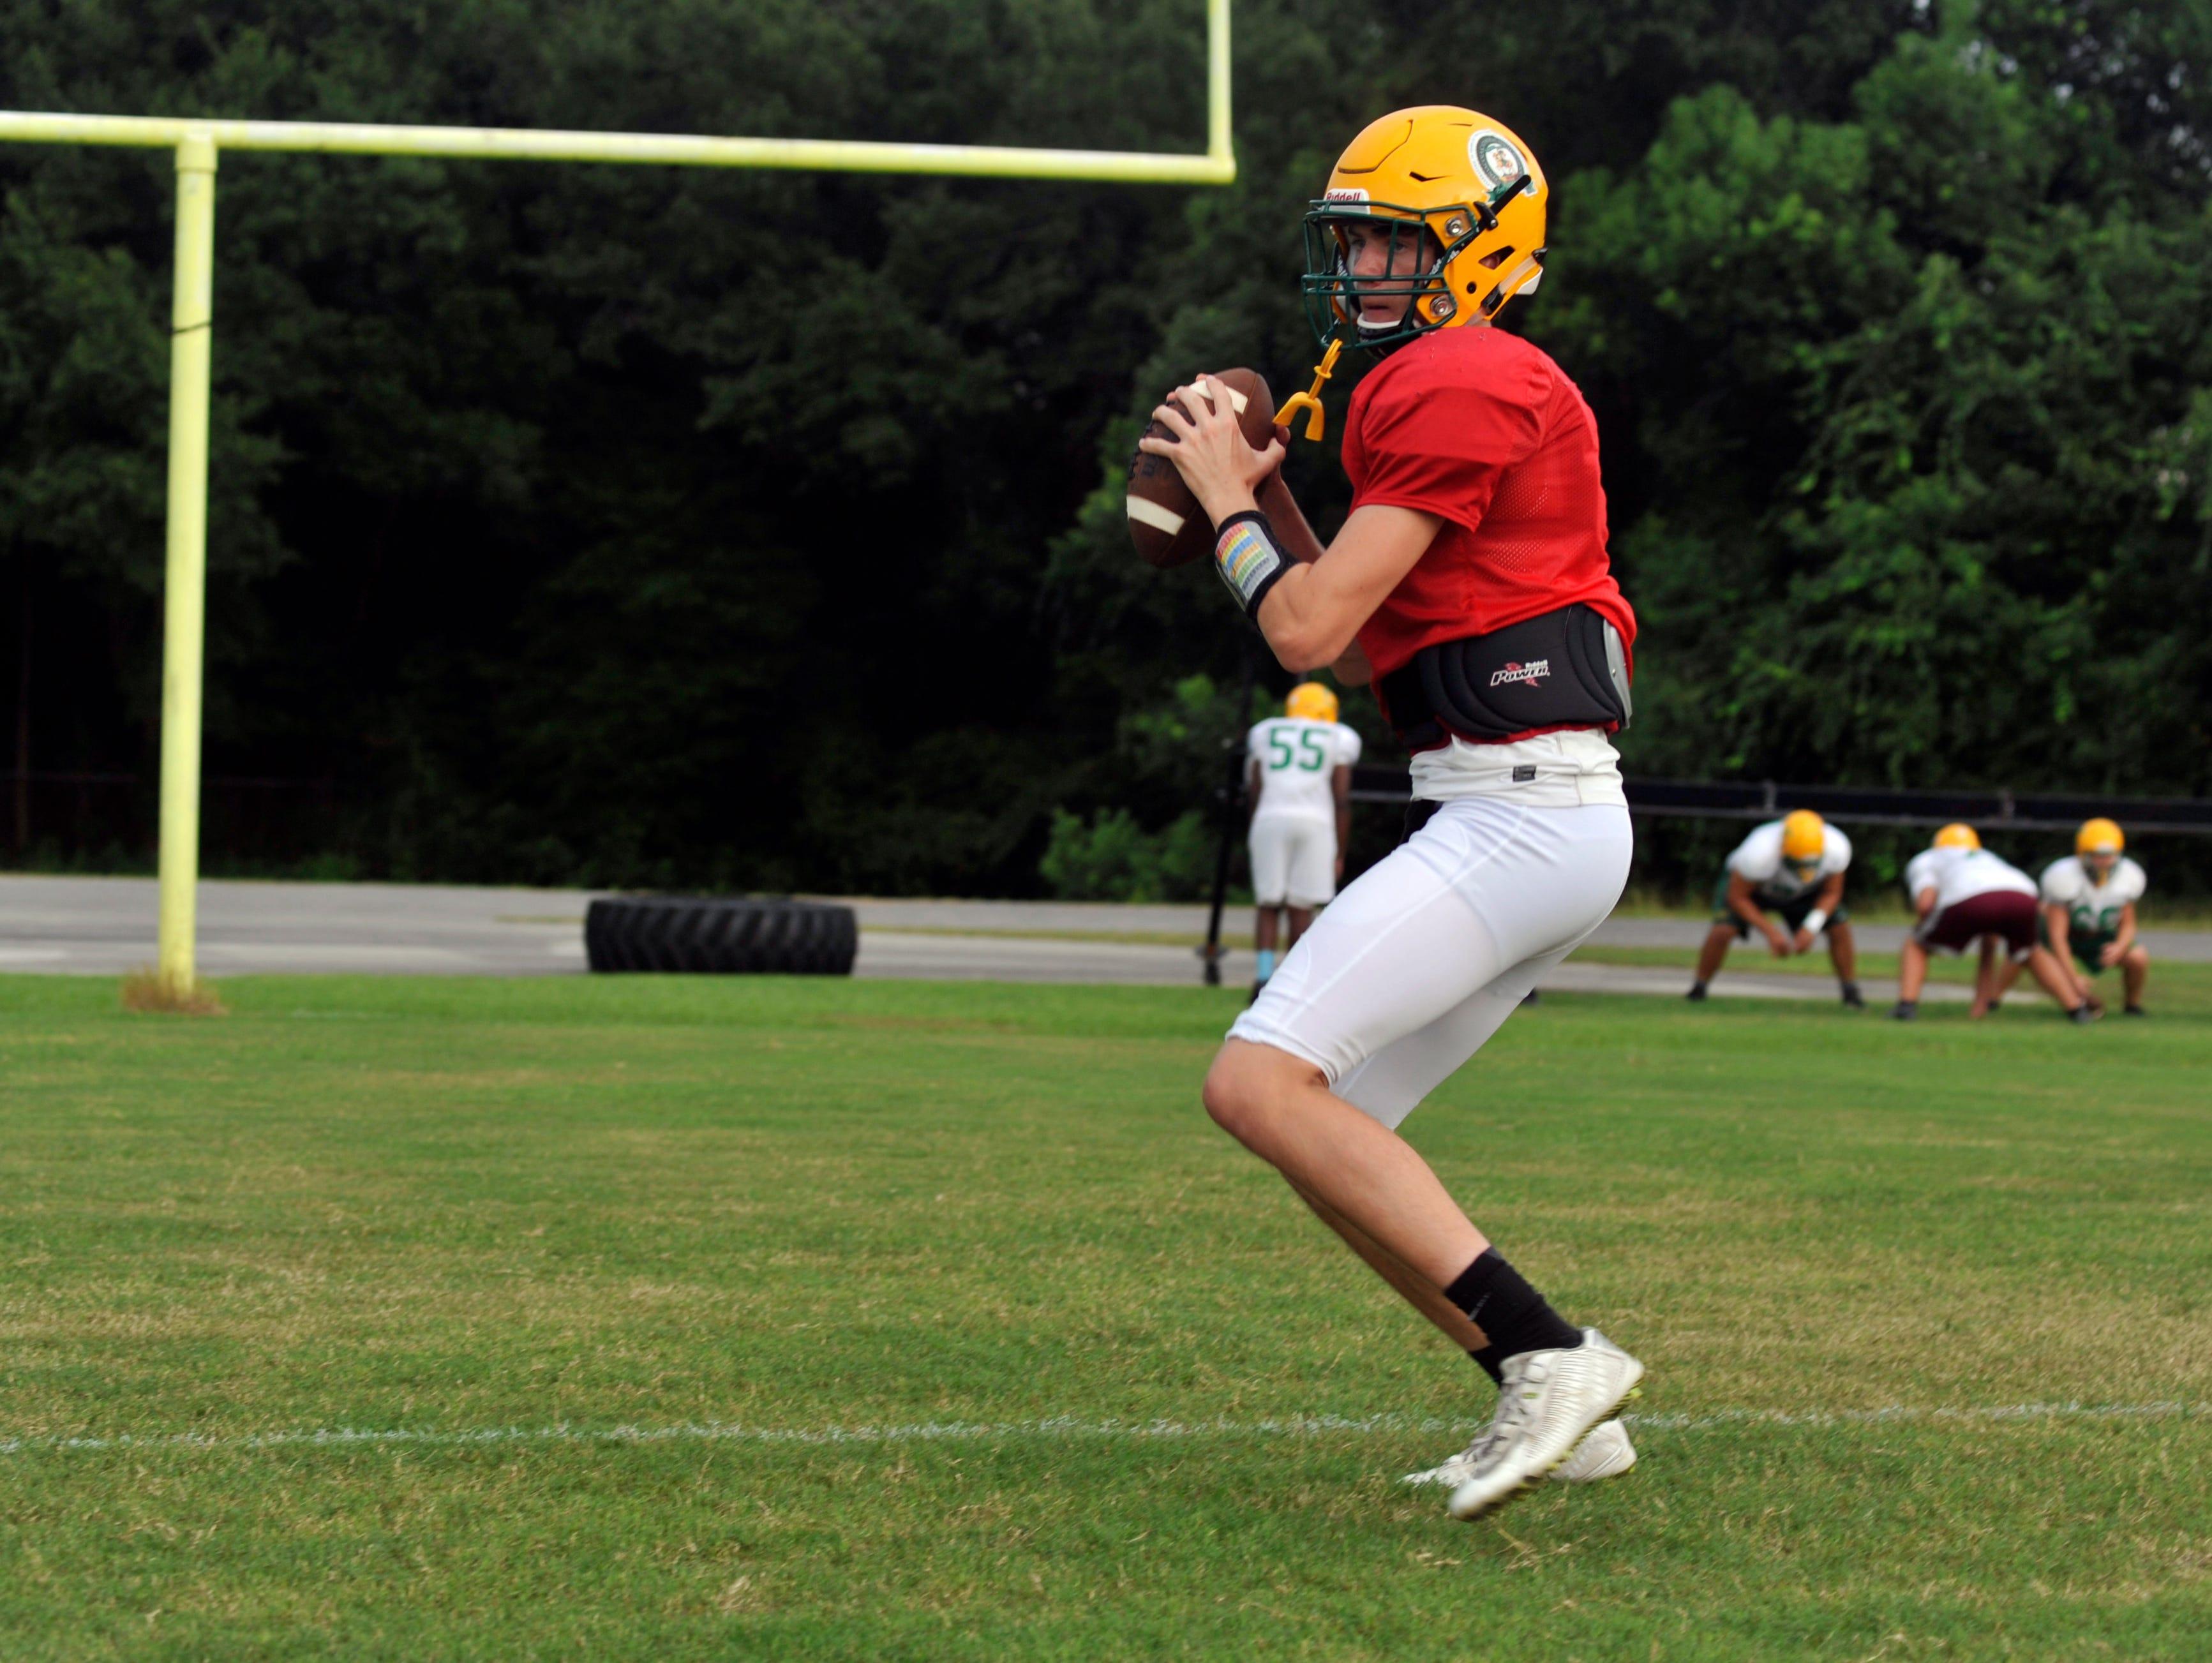 Pensacola Catholic quarterback Garrett Foley takes reps prior to Friday's game against Navarre.